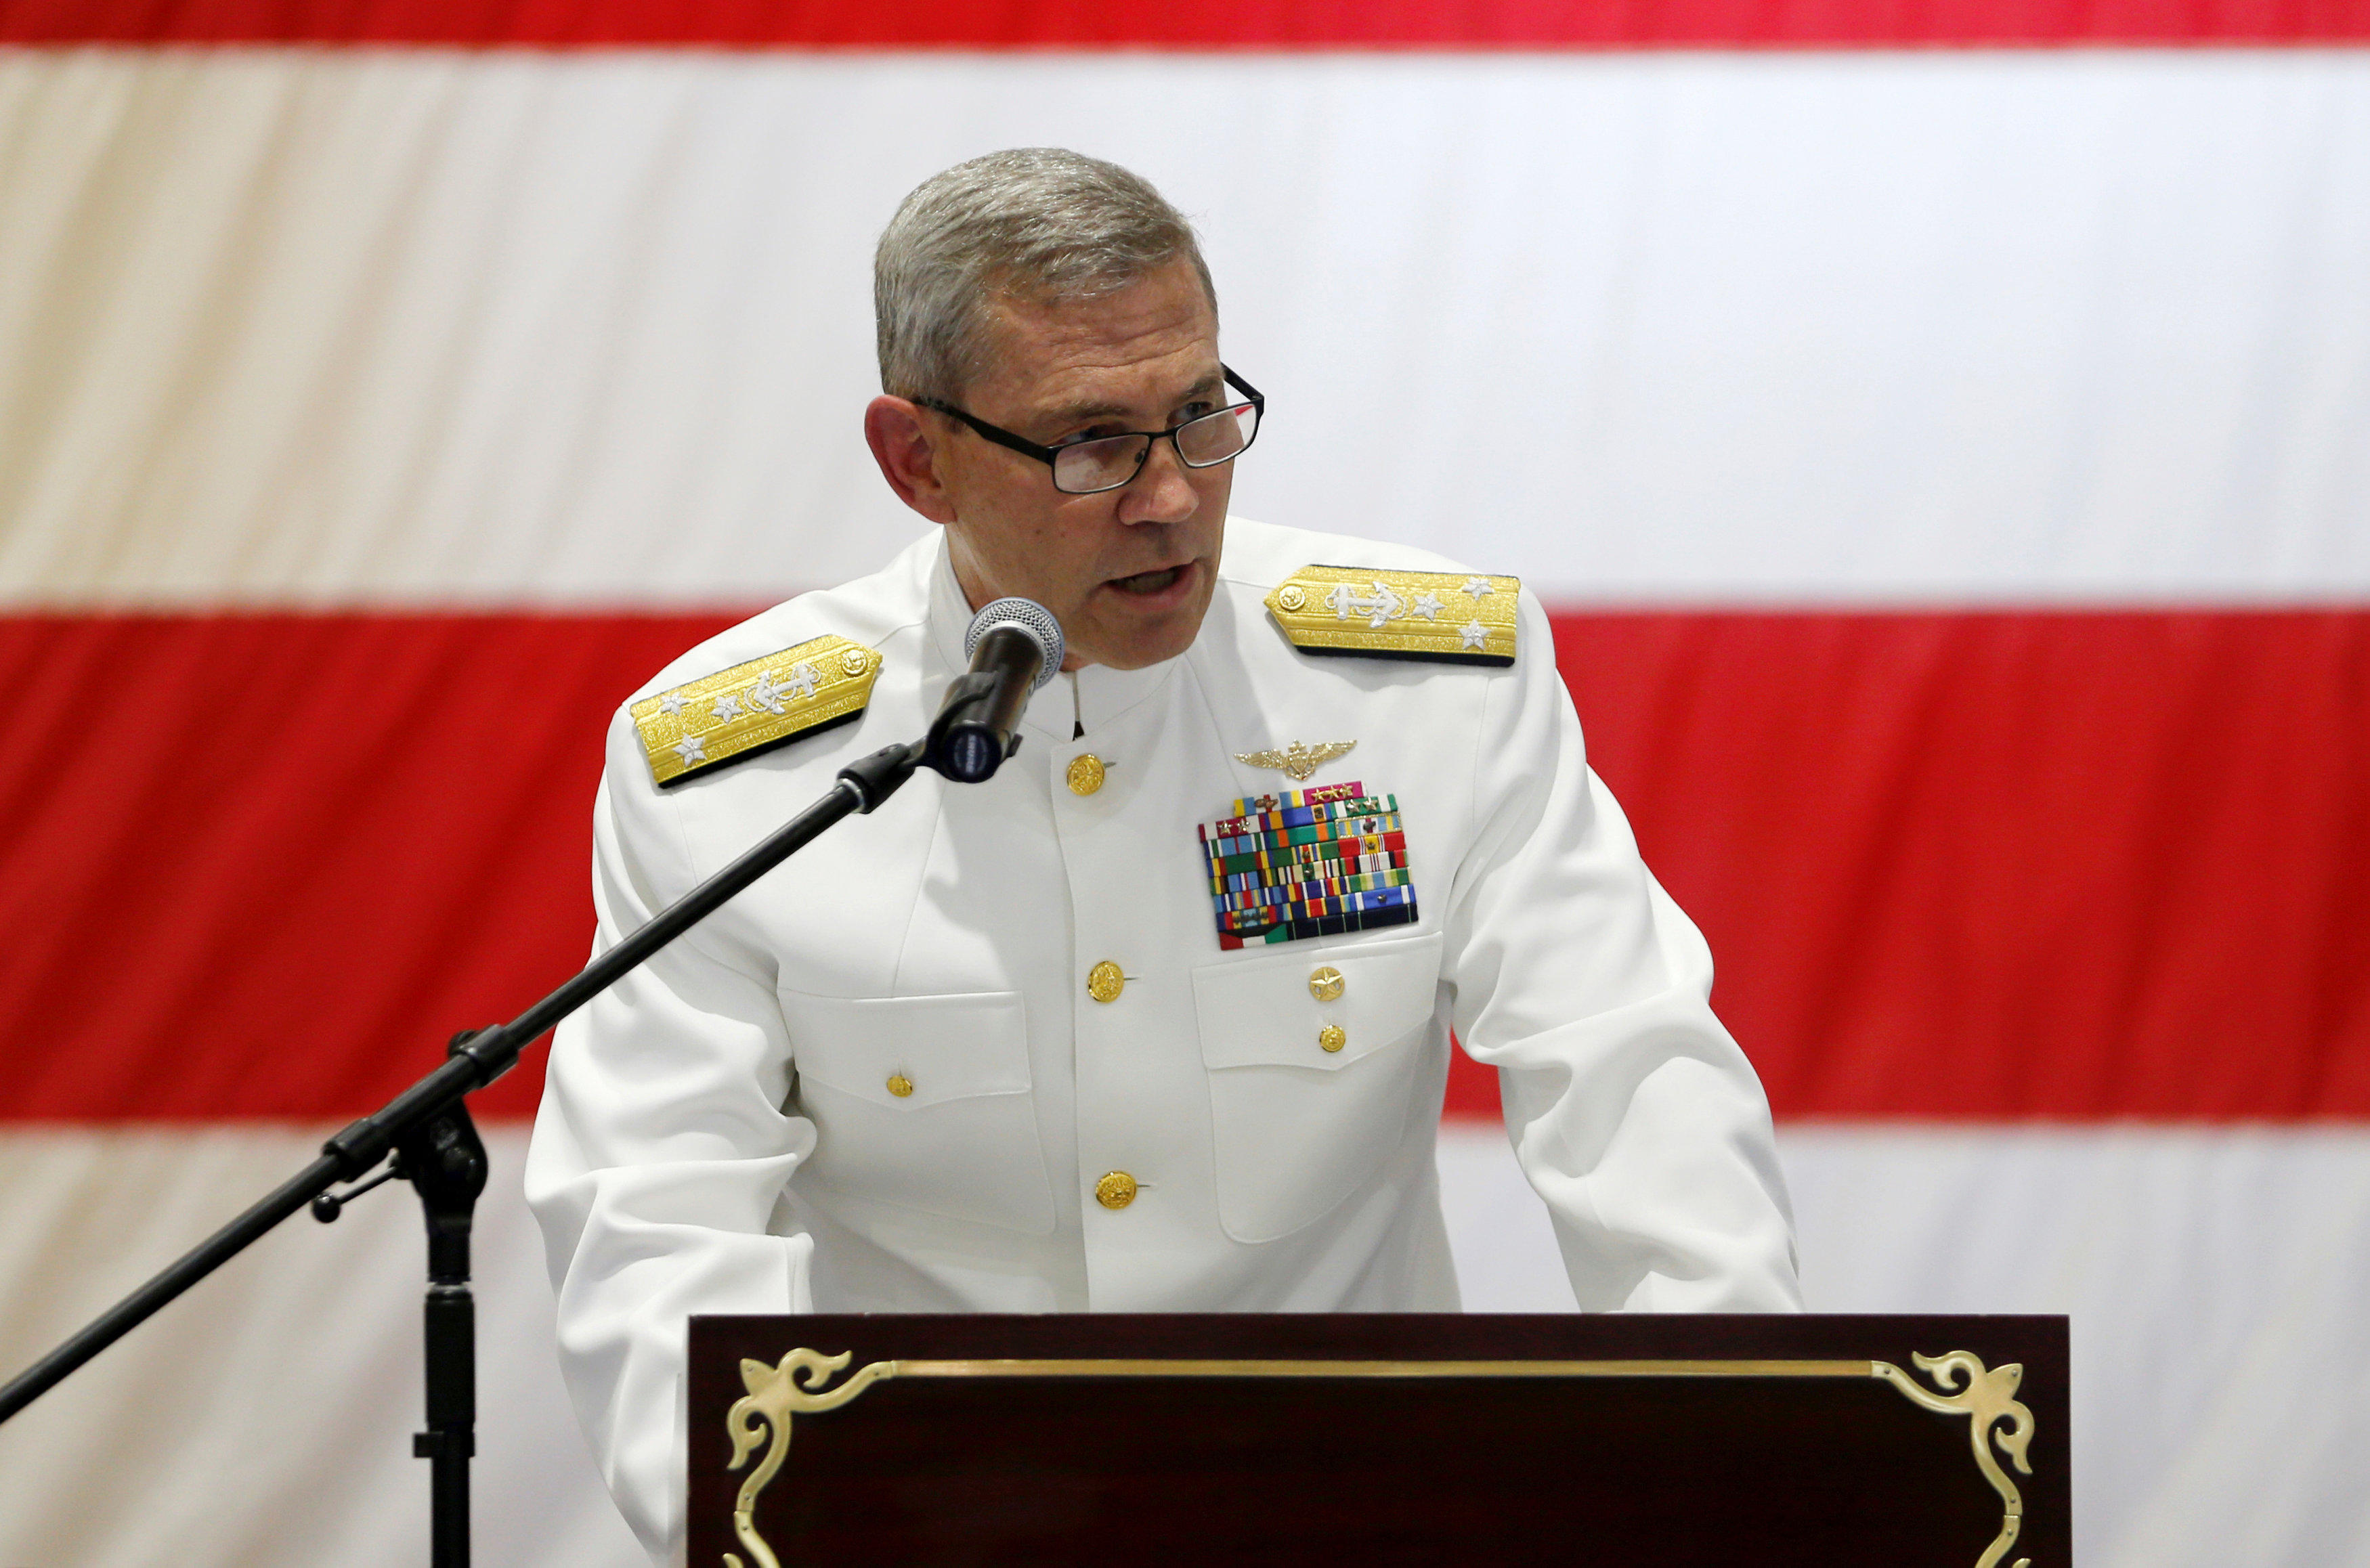 U.S. Navy admiral Scott Stearney found dead in apparent suicide ...